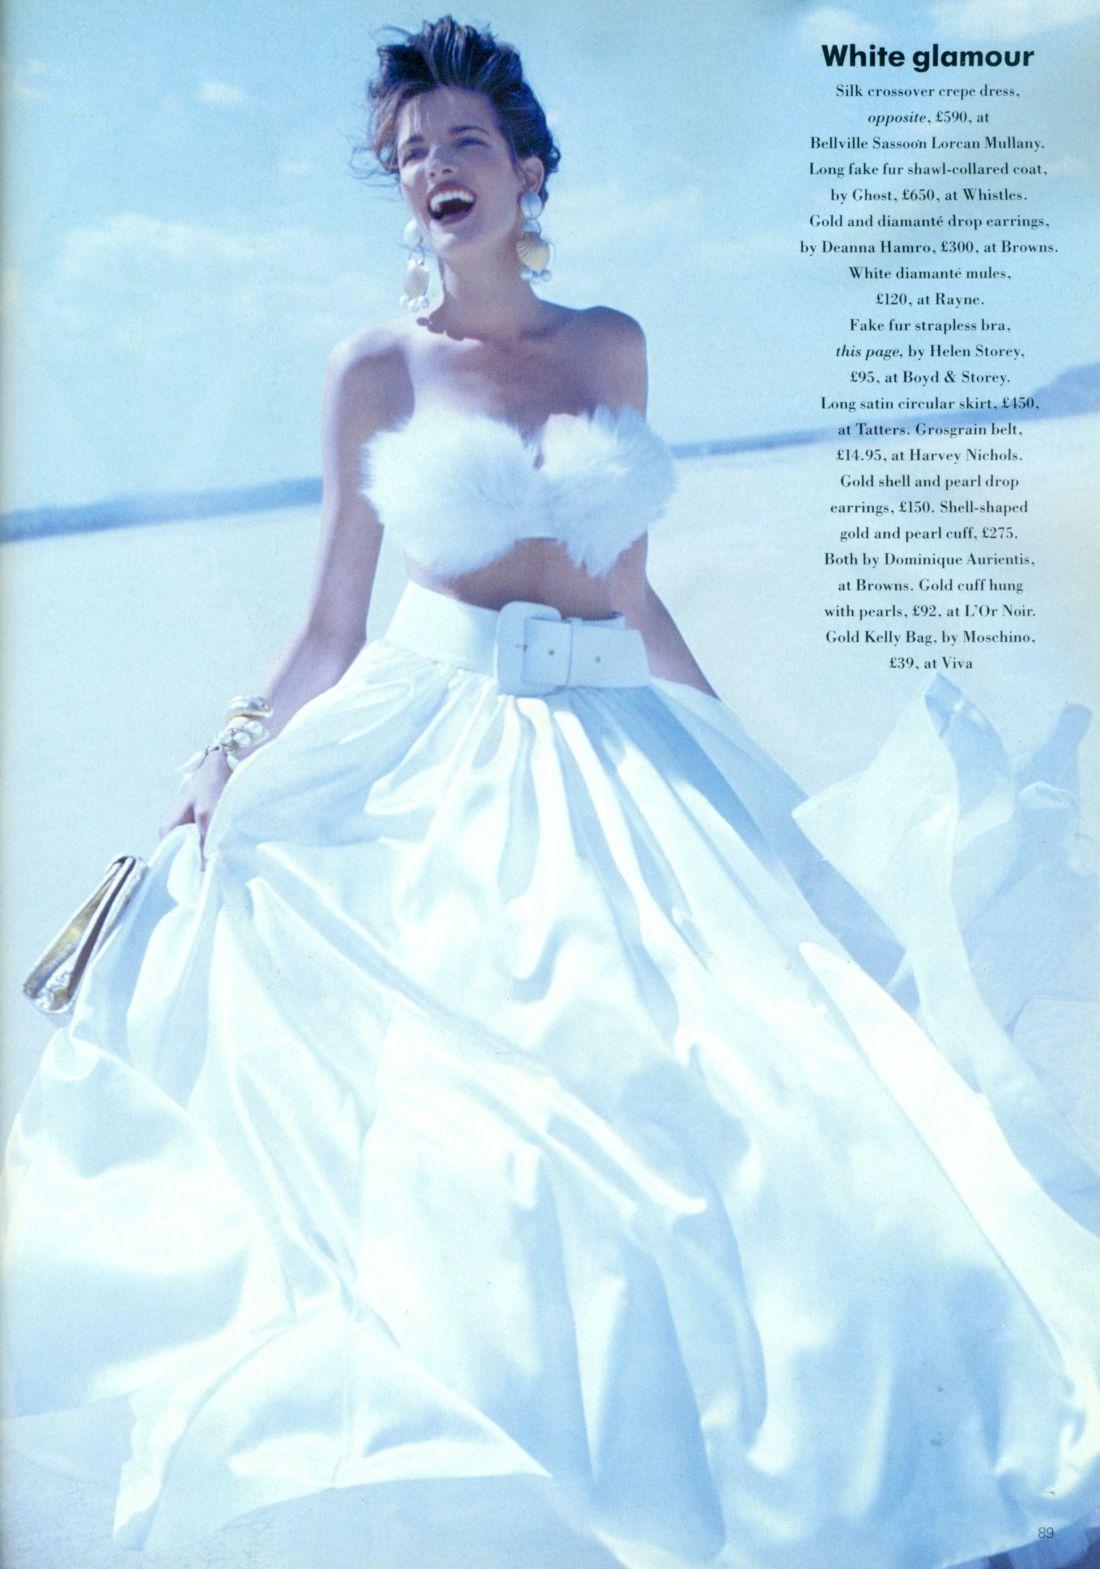 Vogue (UK) July 1990 | Stephanie Seymour 06.jpg